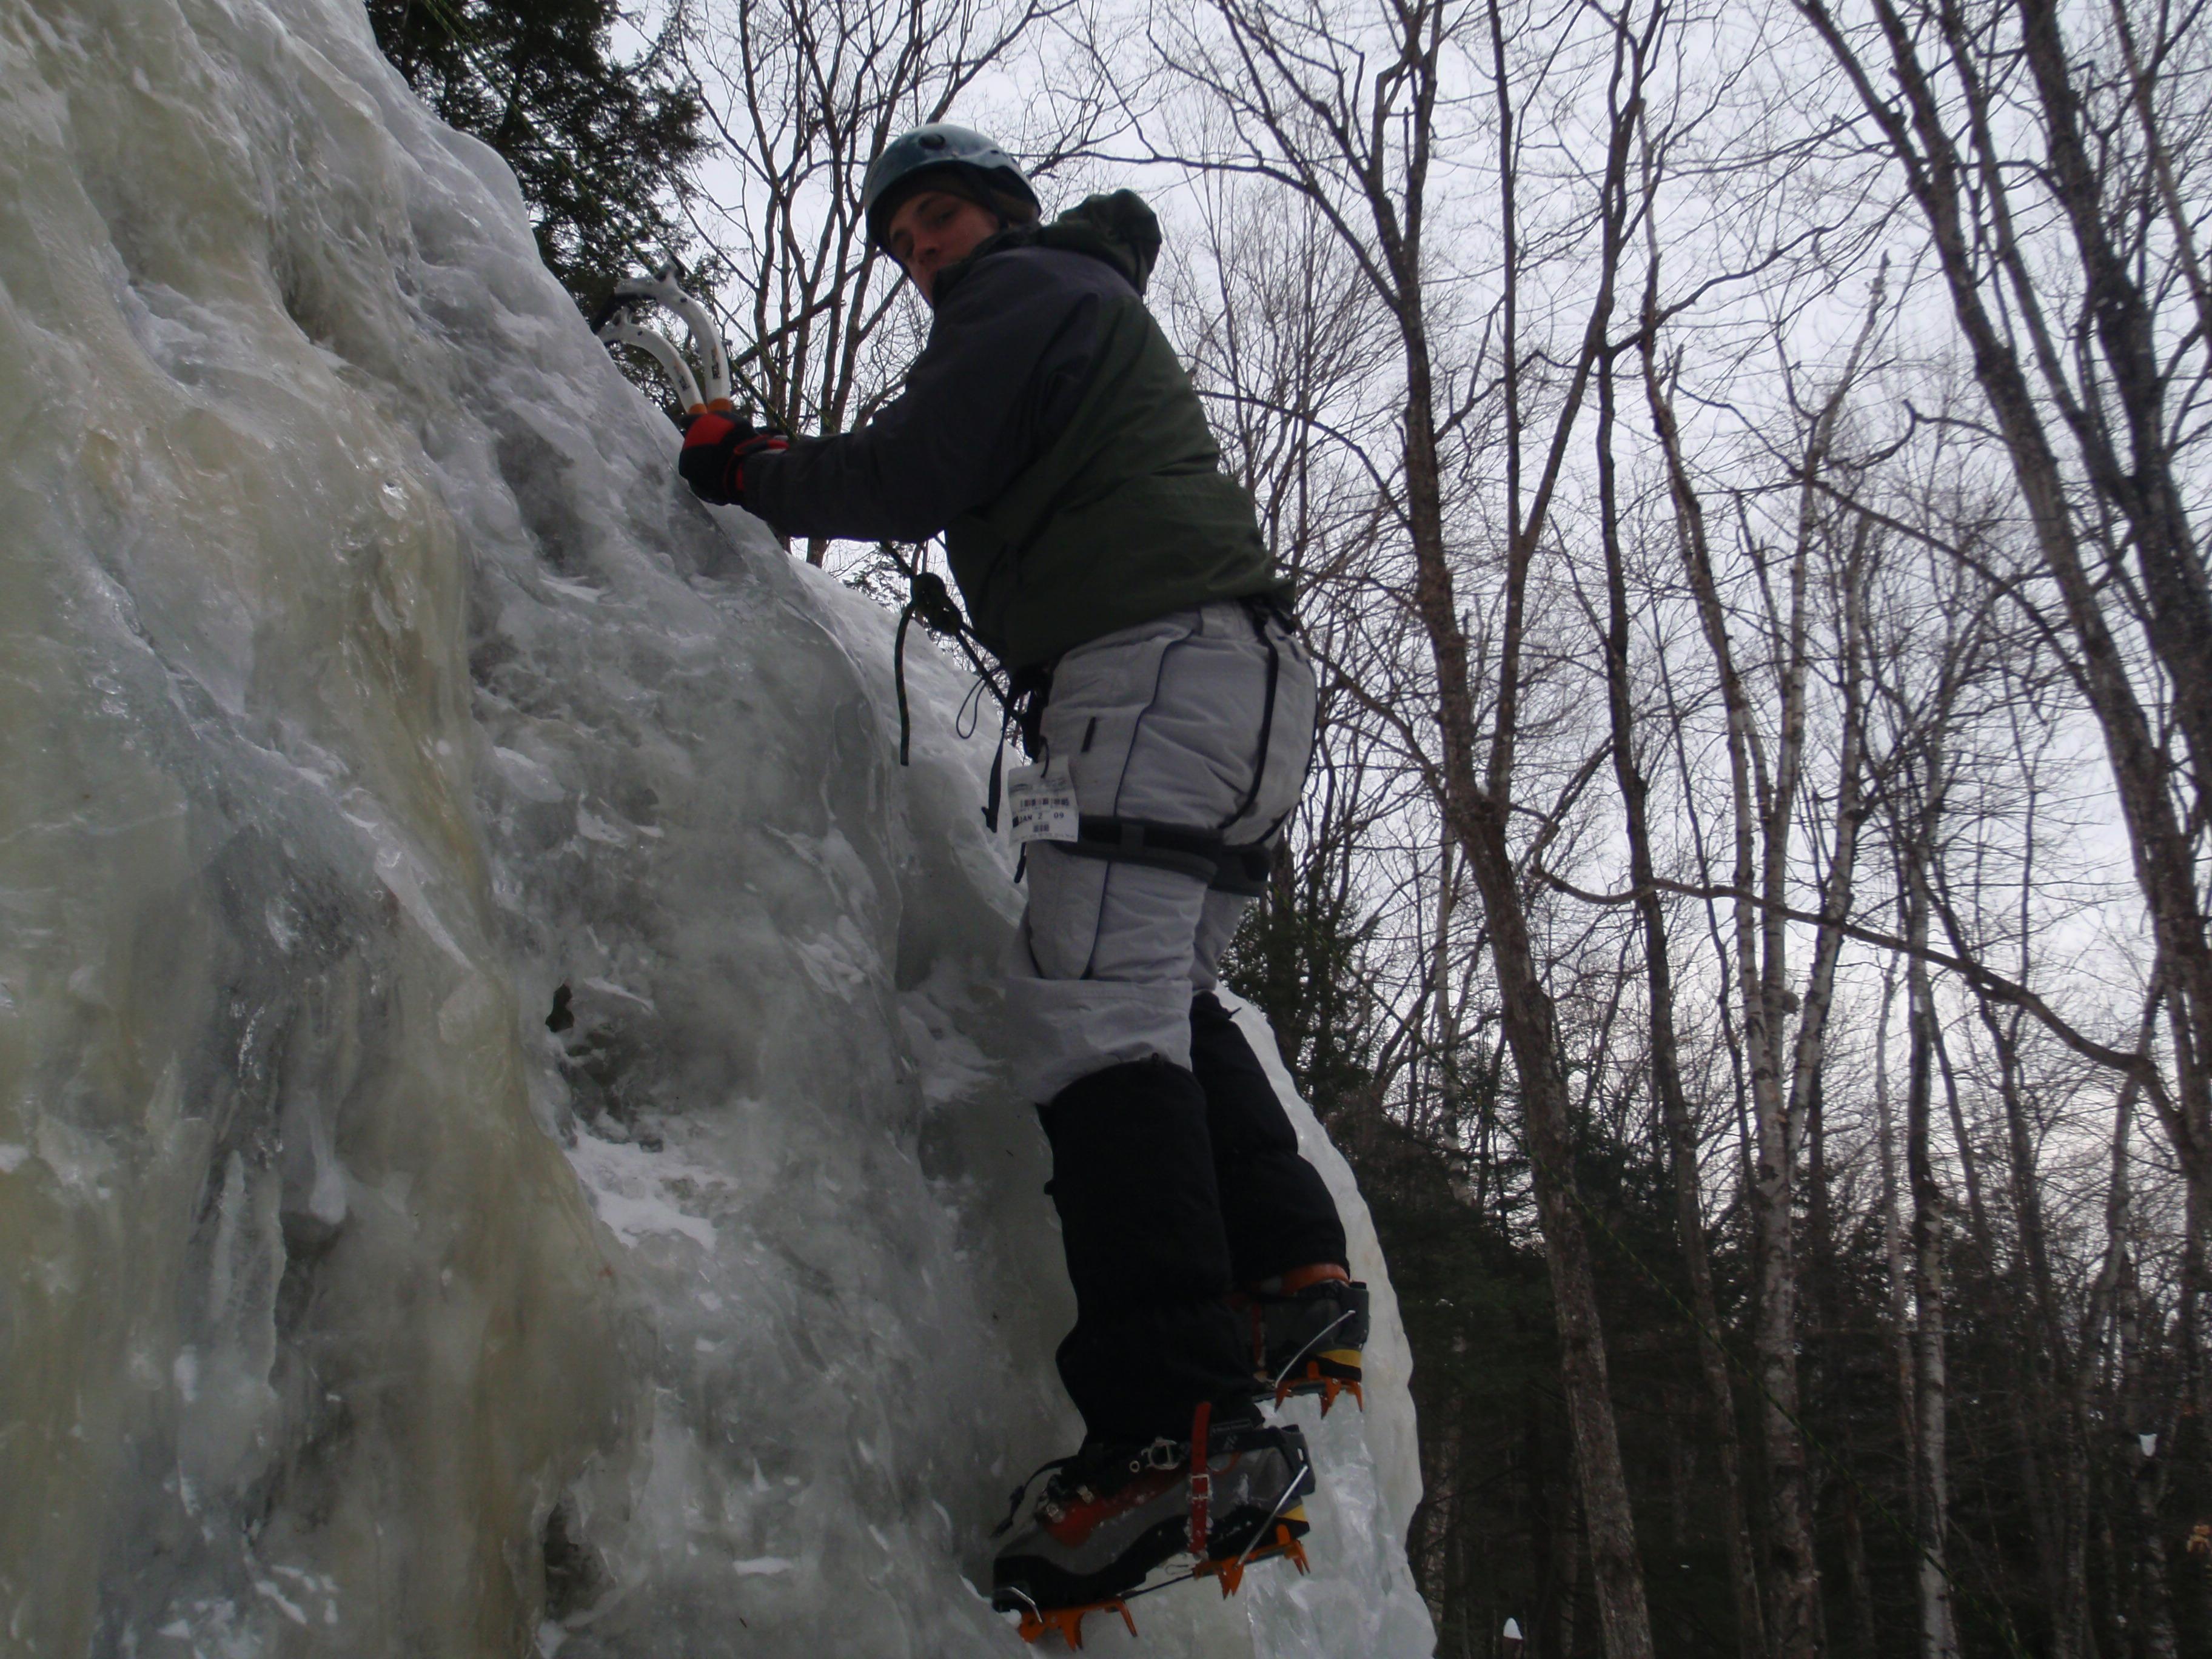 Randy on the steeps...